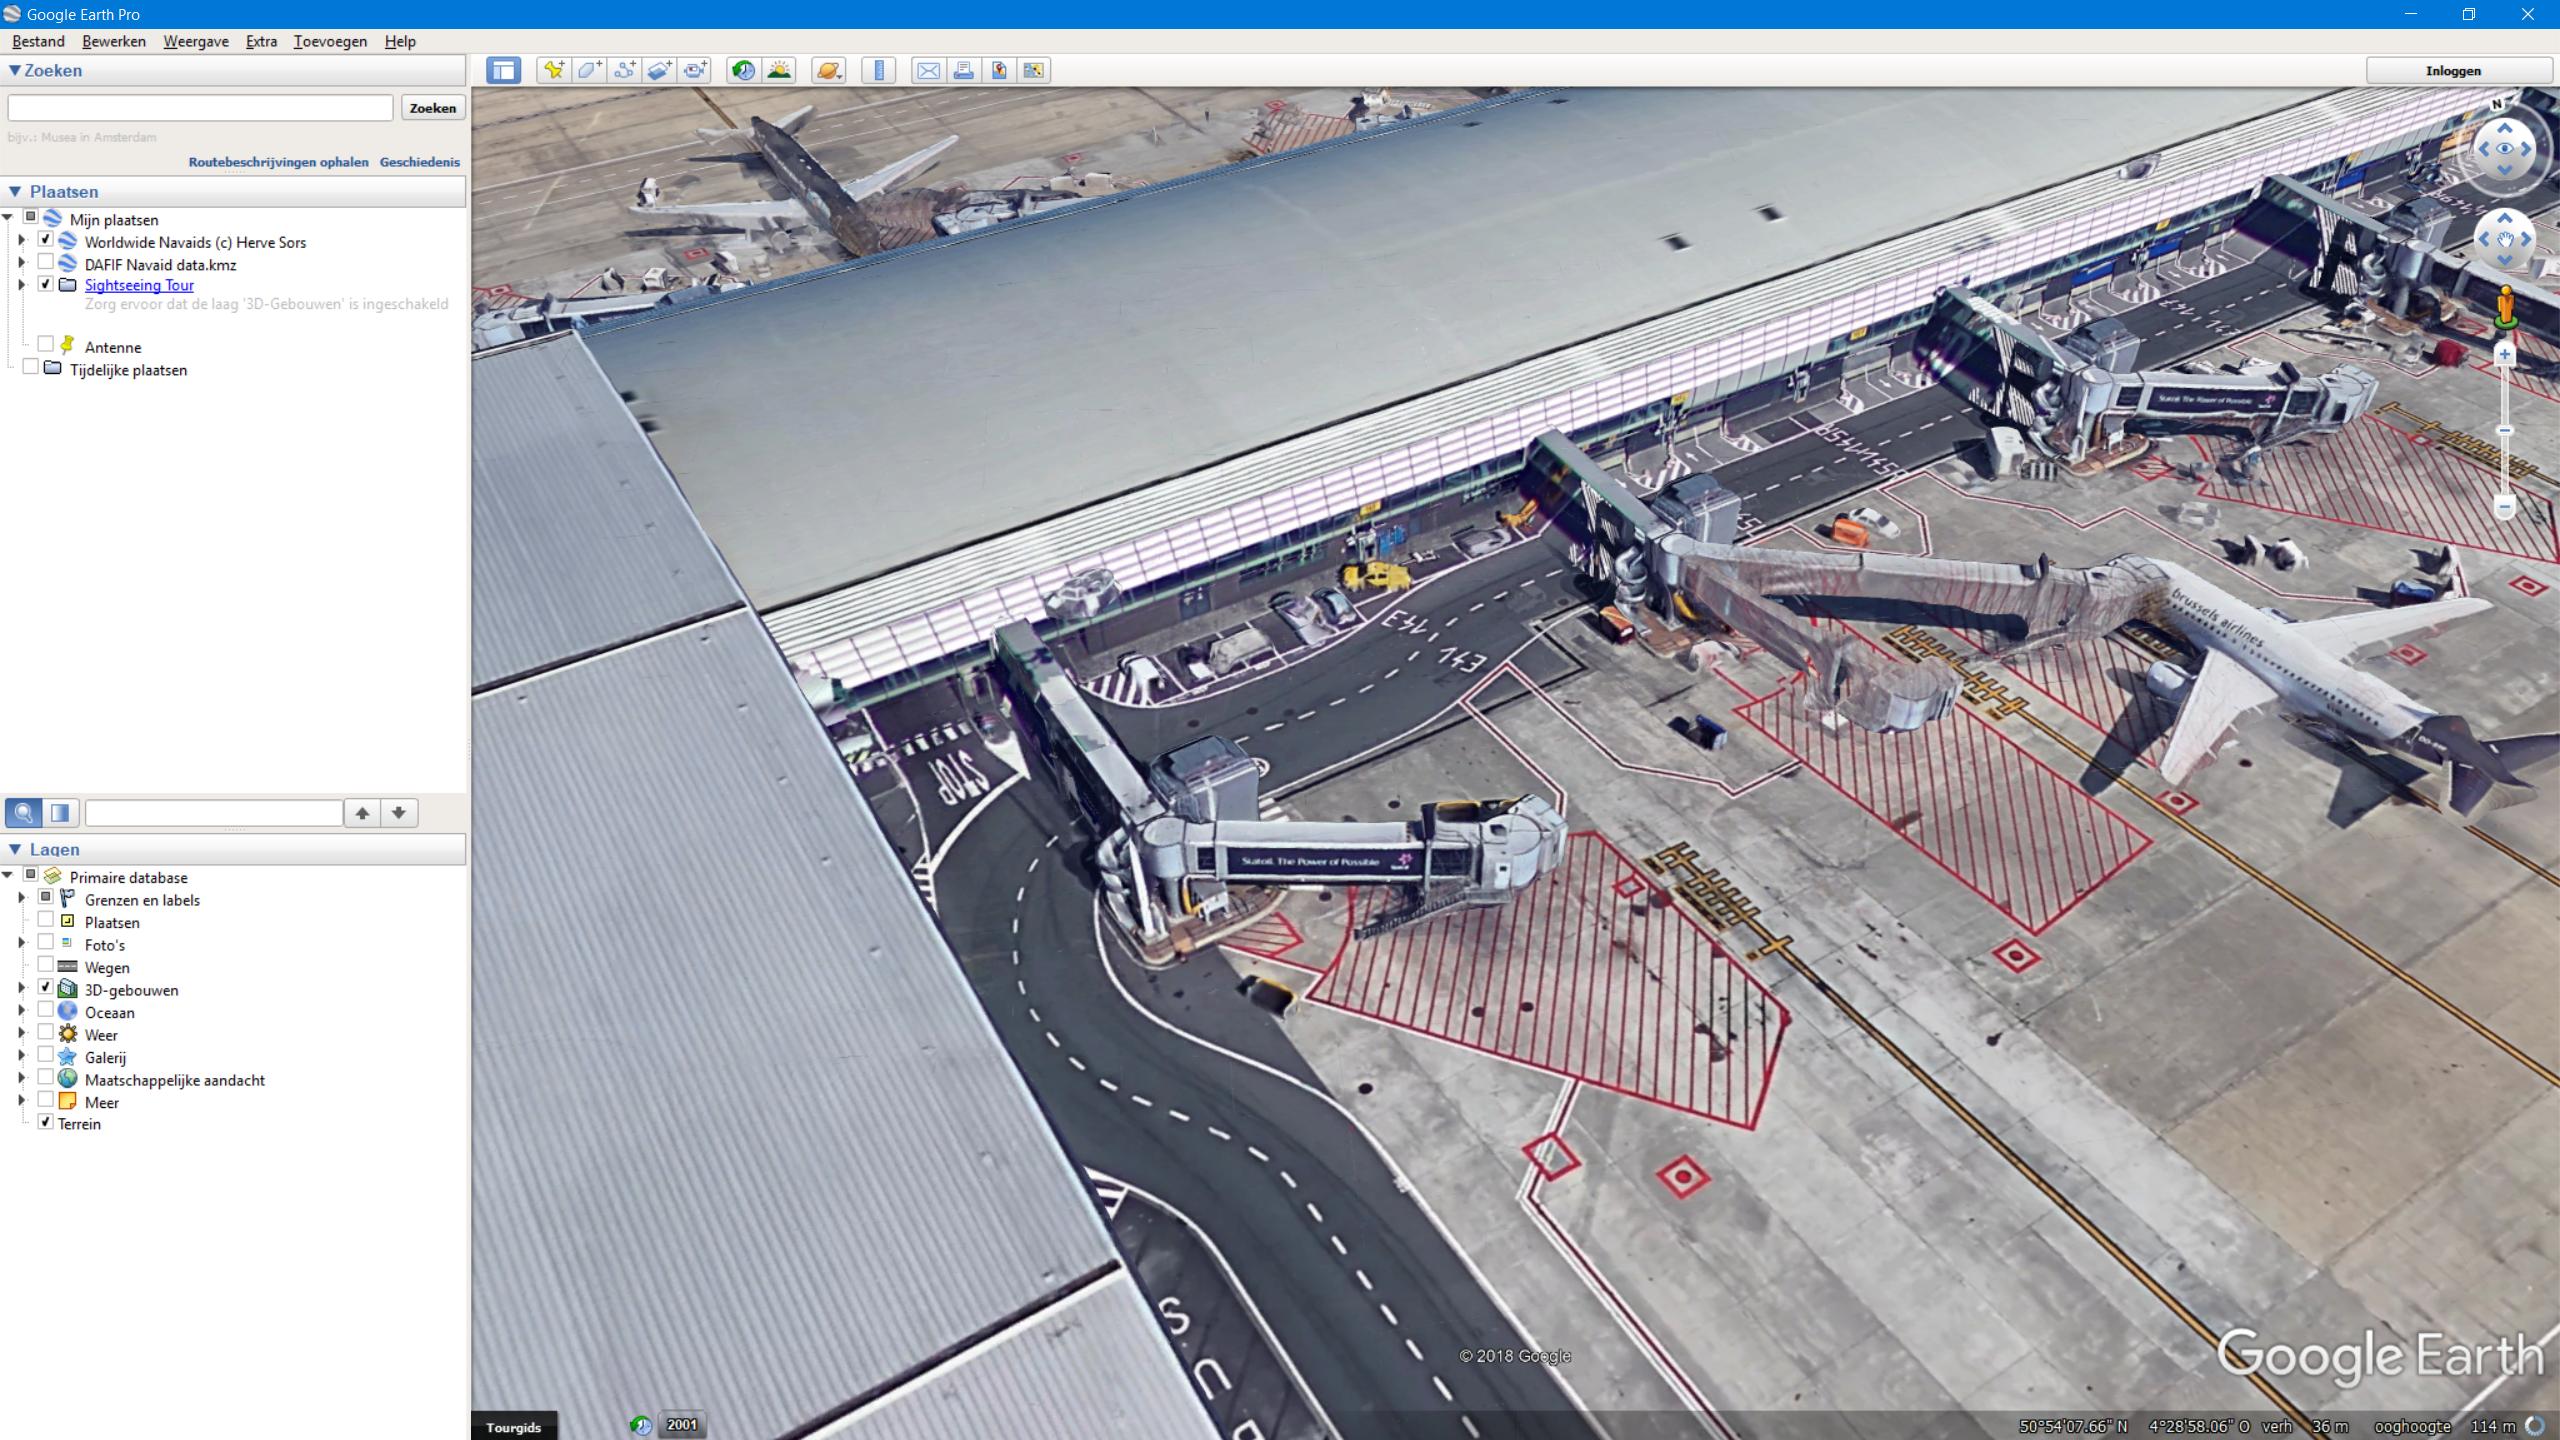 P3D V4 / FSX] EBBR freeware: need a jetway modeller